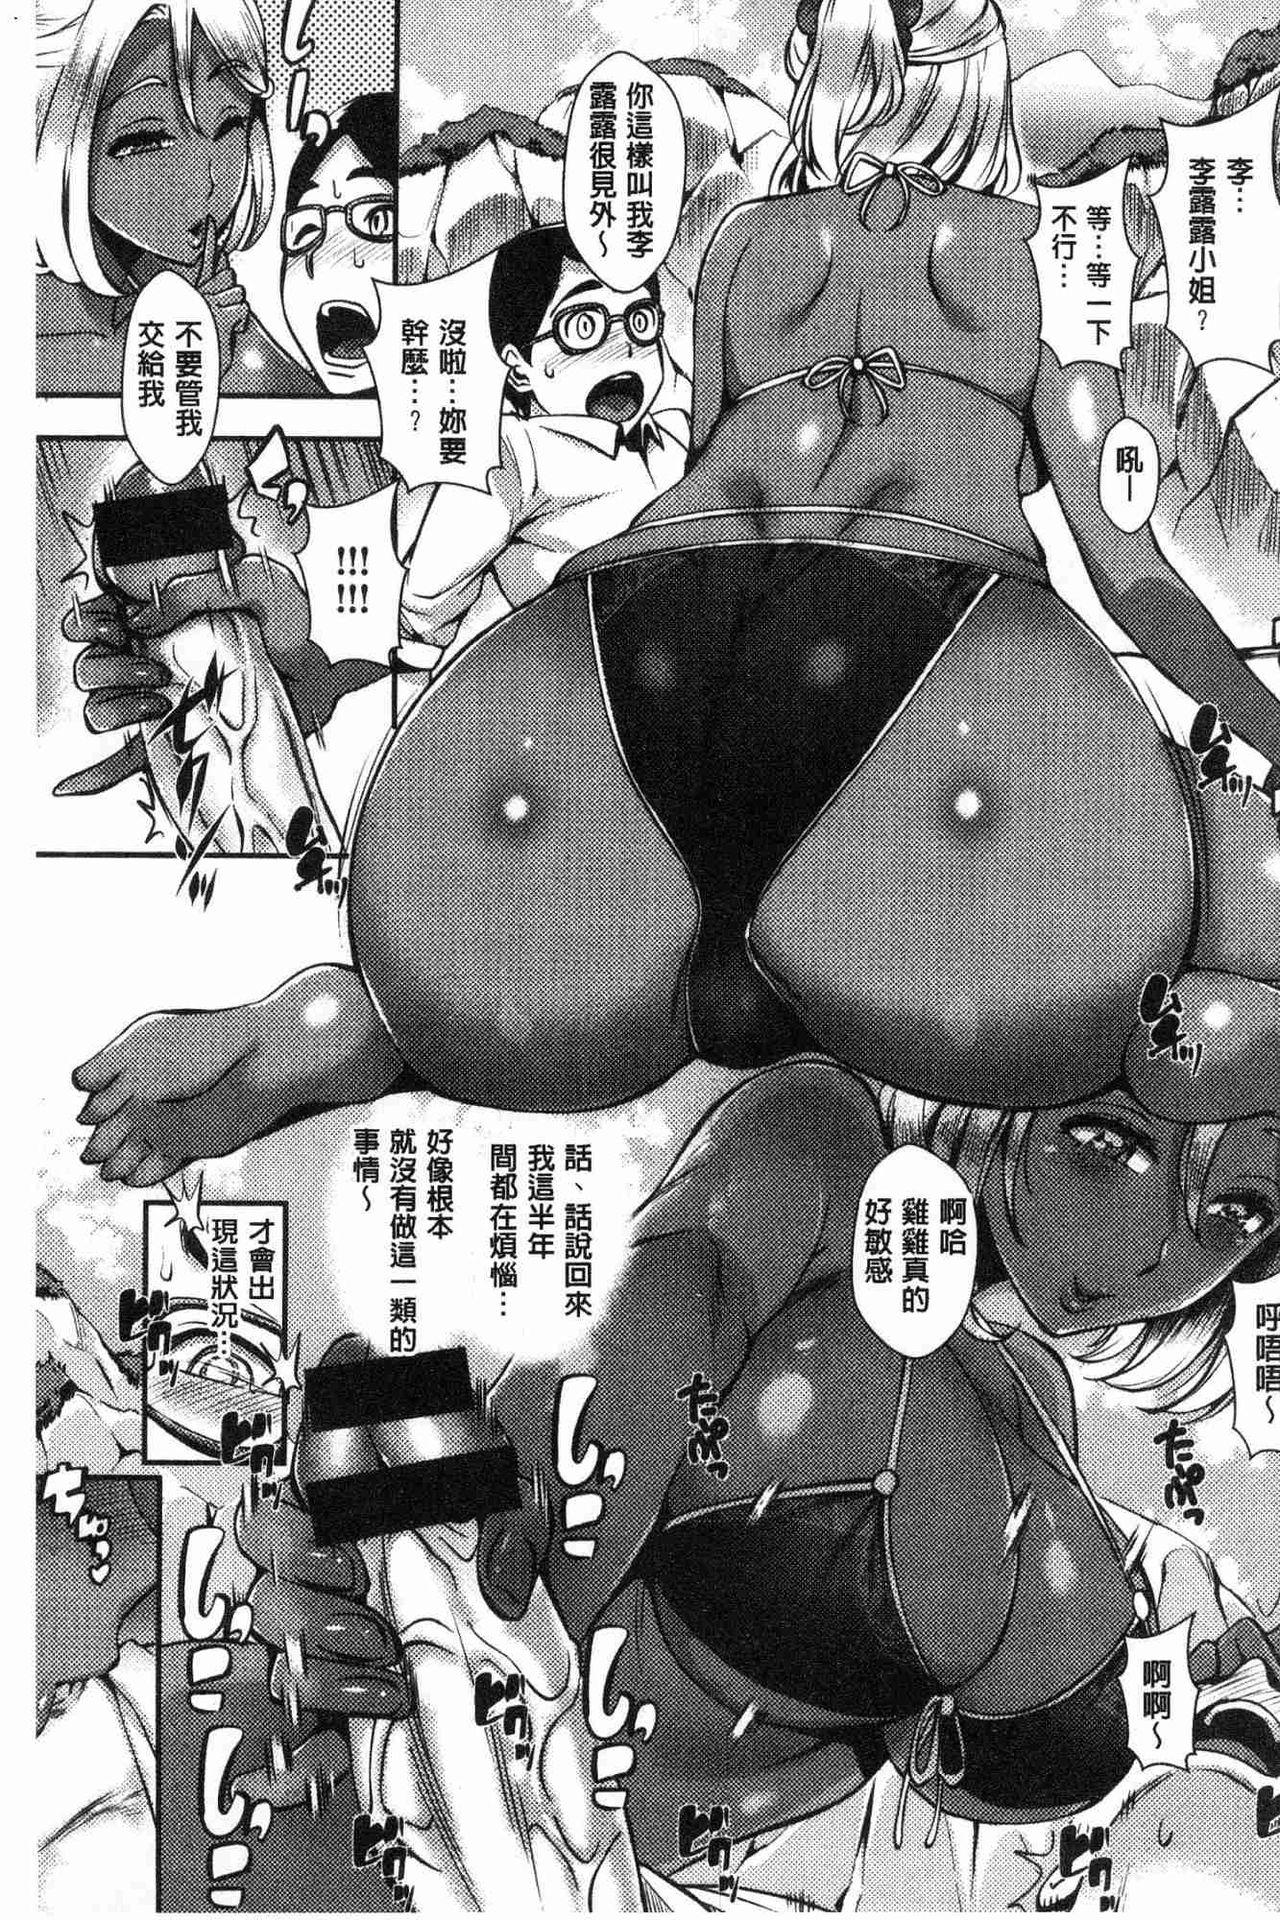 SEX LECTURE 68